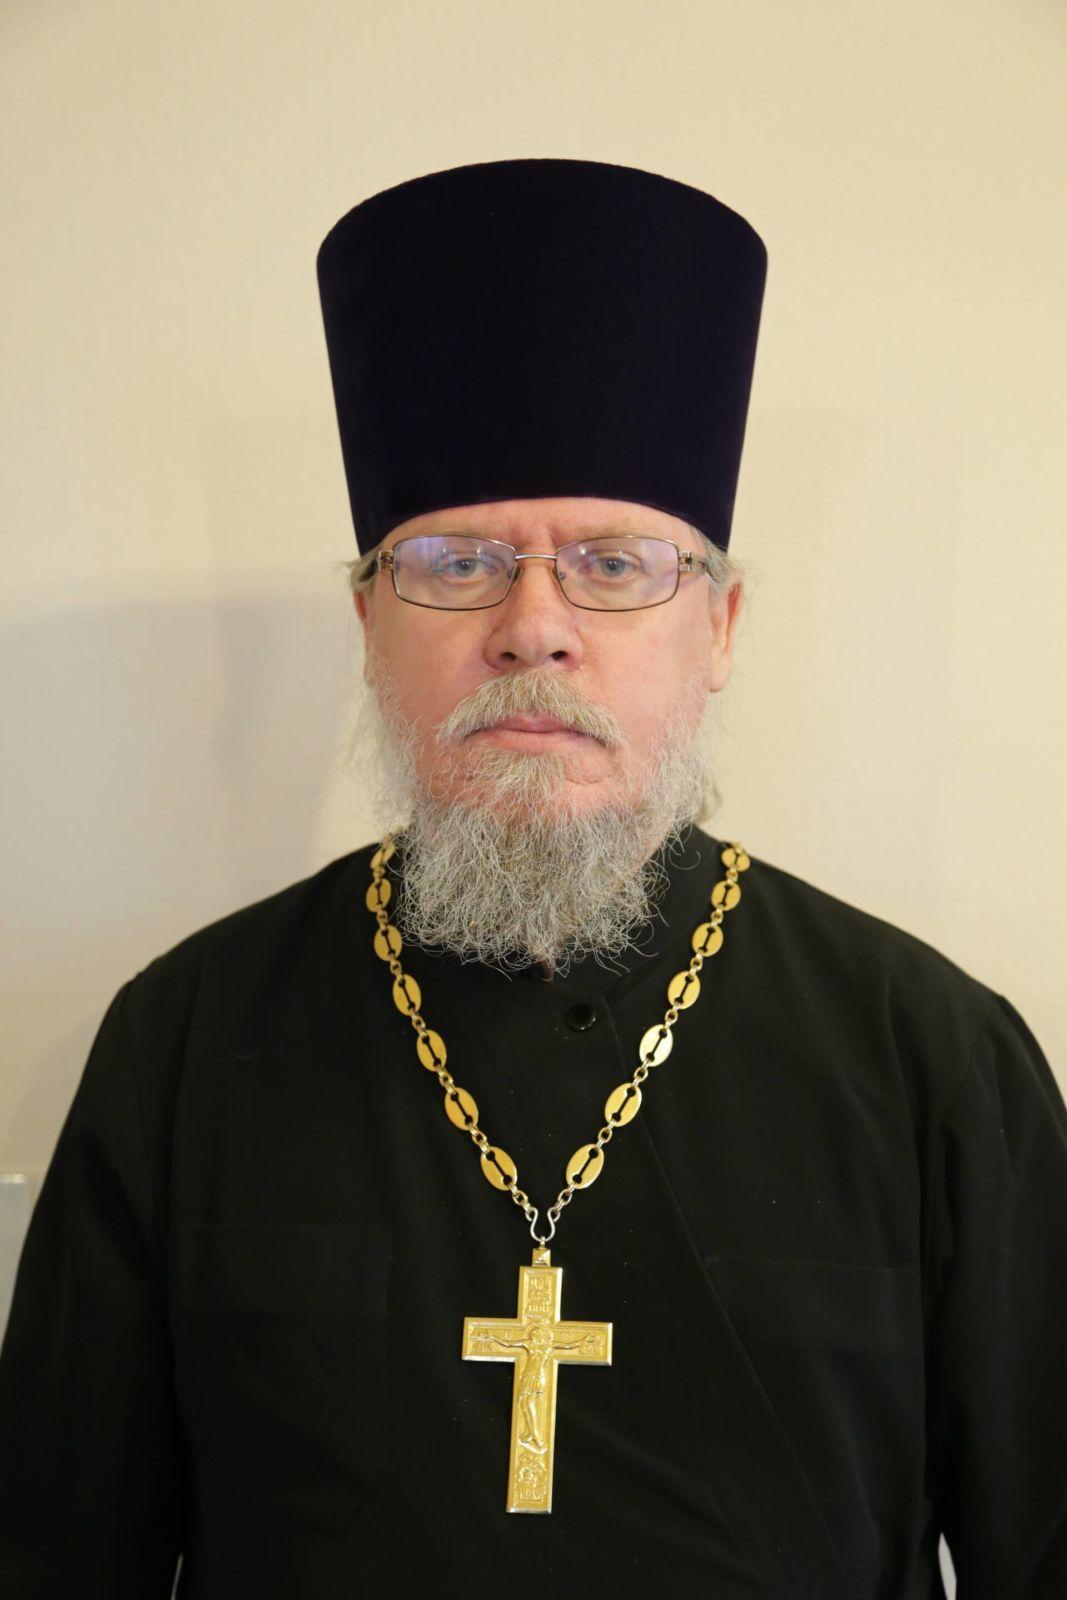 Протоиерей — Константин Михайлович Макаров